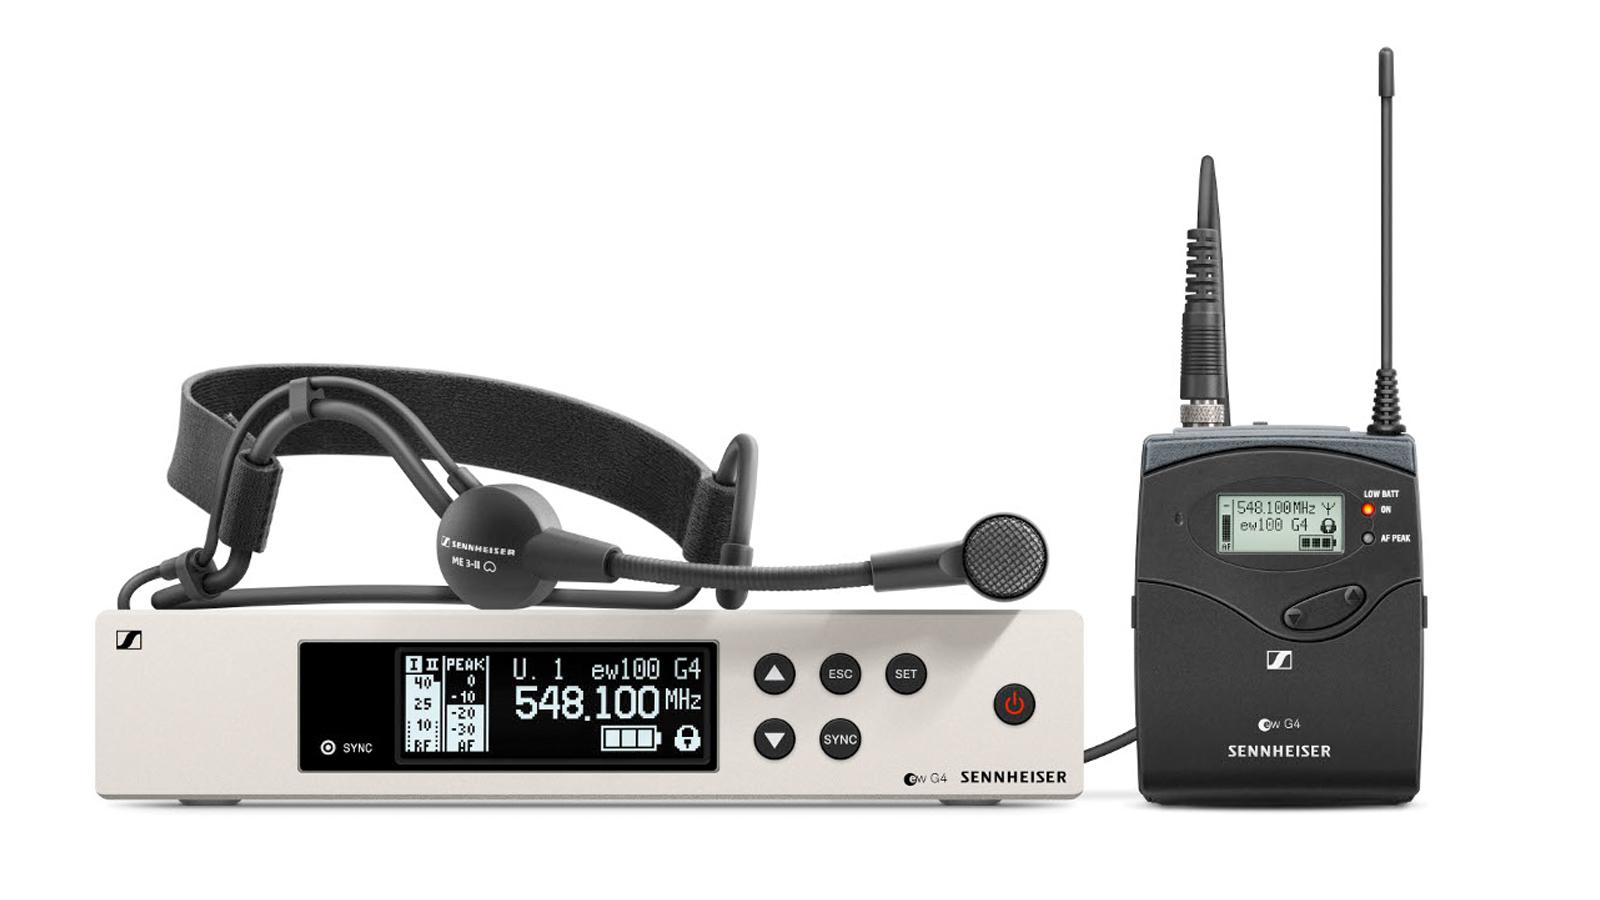 Sennheiser ew 100 G4-ME3 1G8 Headset Funkset